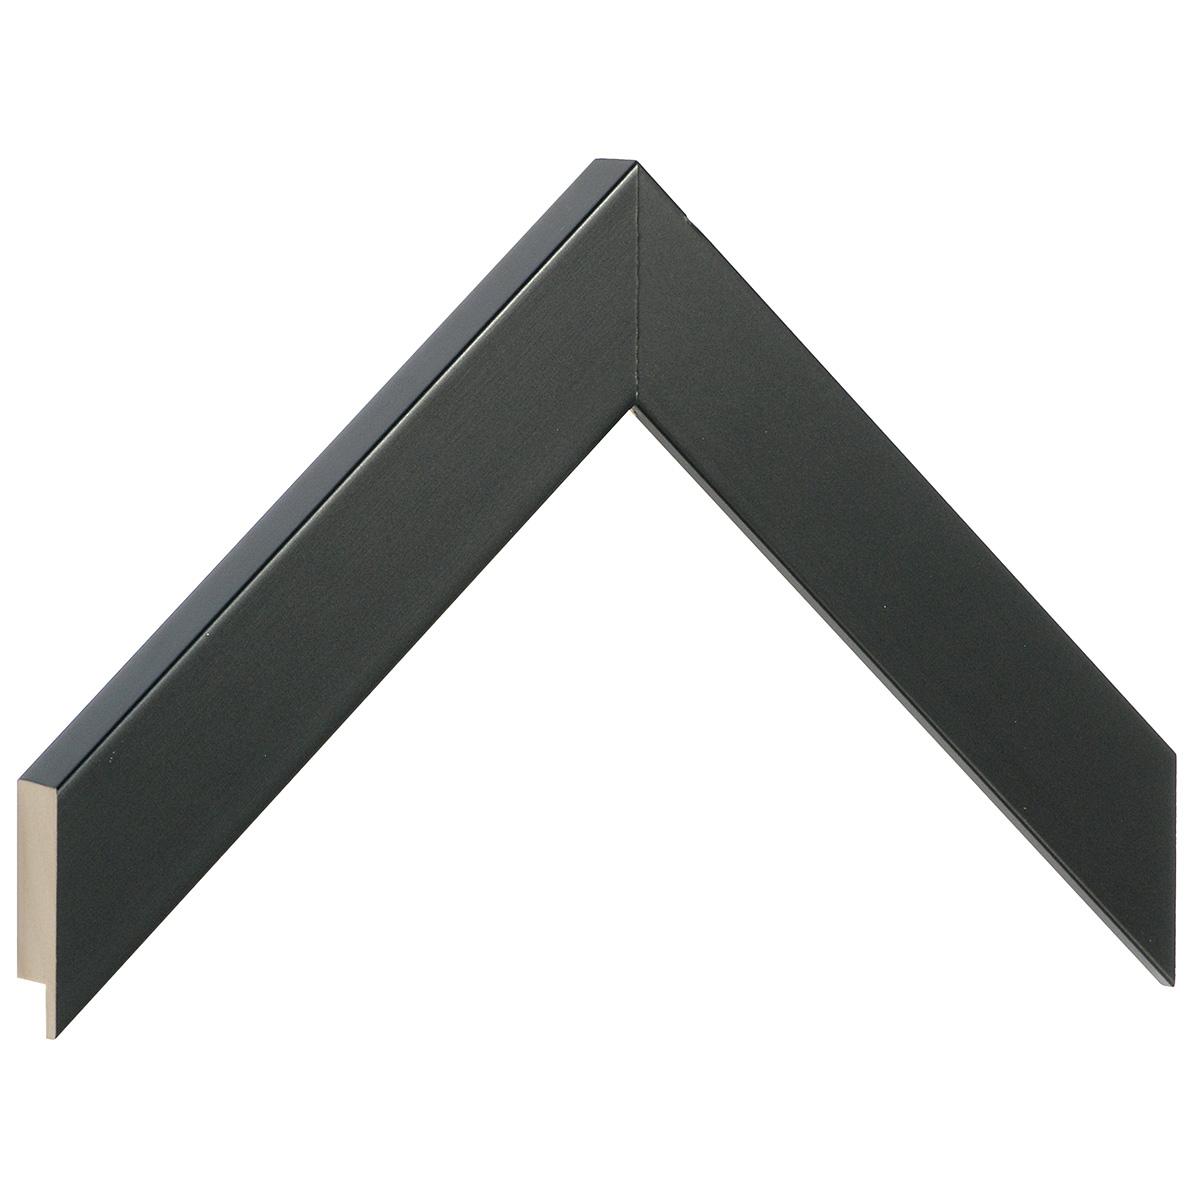 Moulding ayous, width 30mm height 20 - Matt black